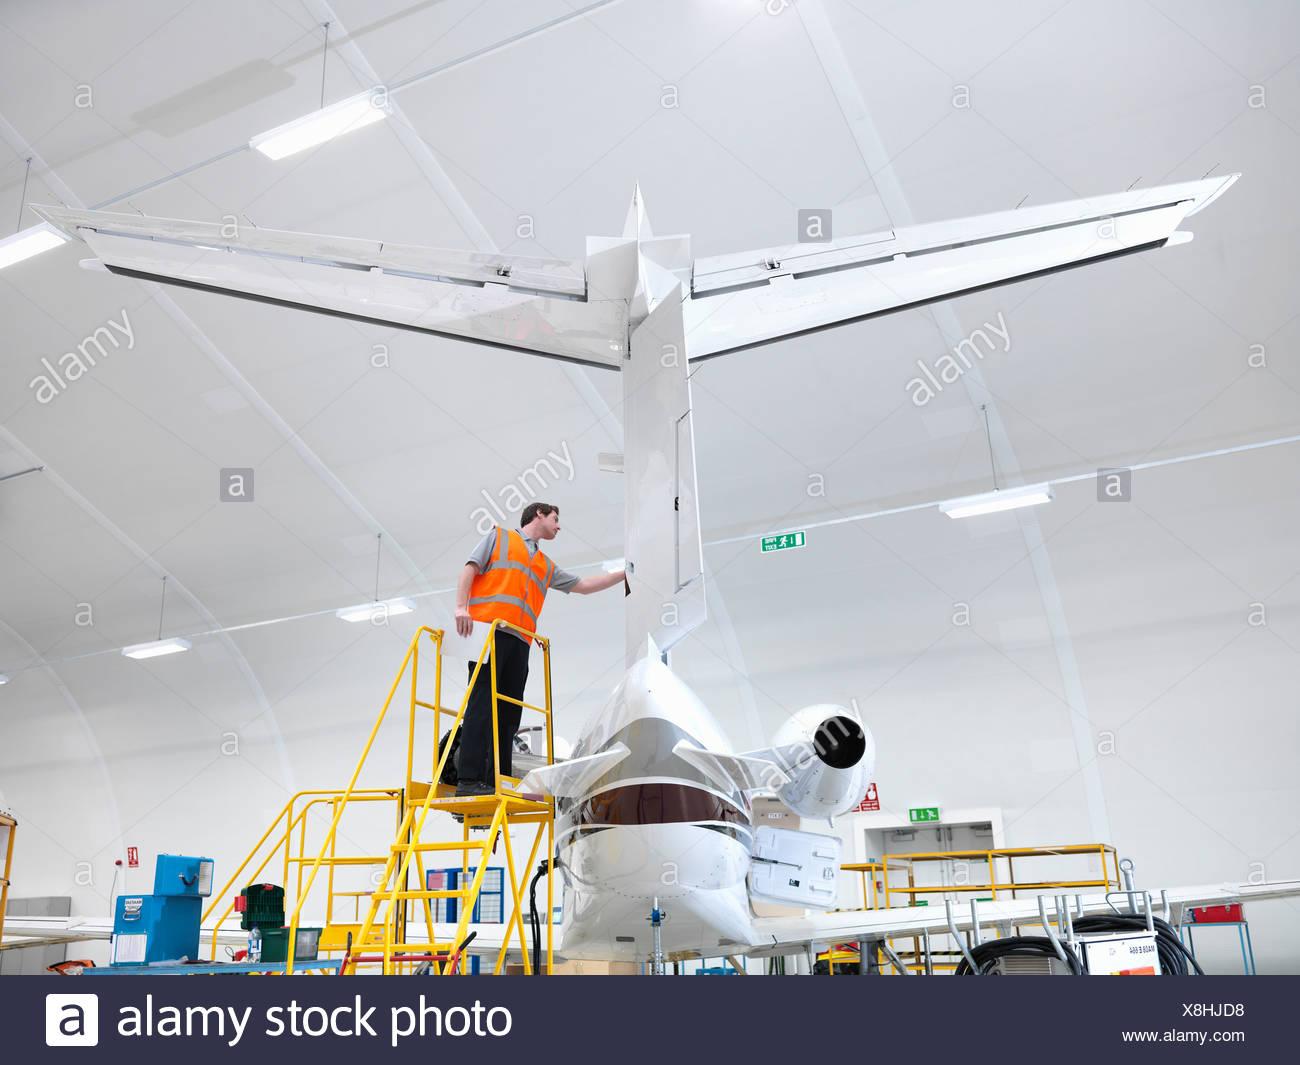 Engineer inspecting jet aircraft - Stock Image